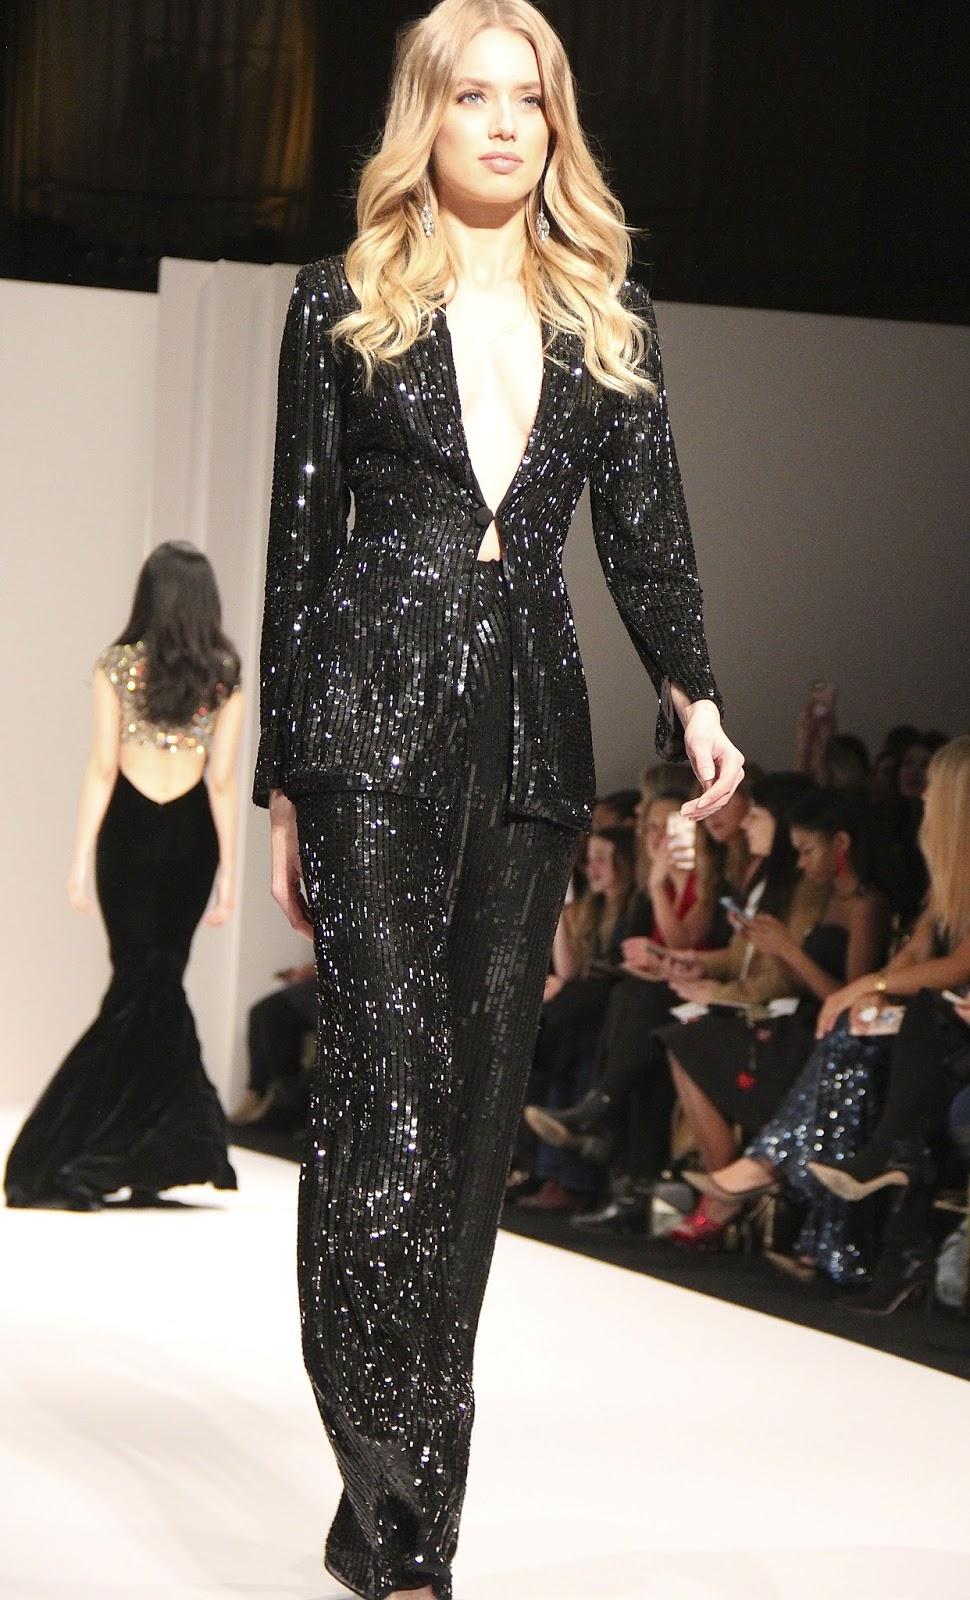 bc52de67fae fashionably petite  Sherri Hill Fall 2018 at New York Fashion Week